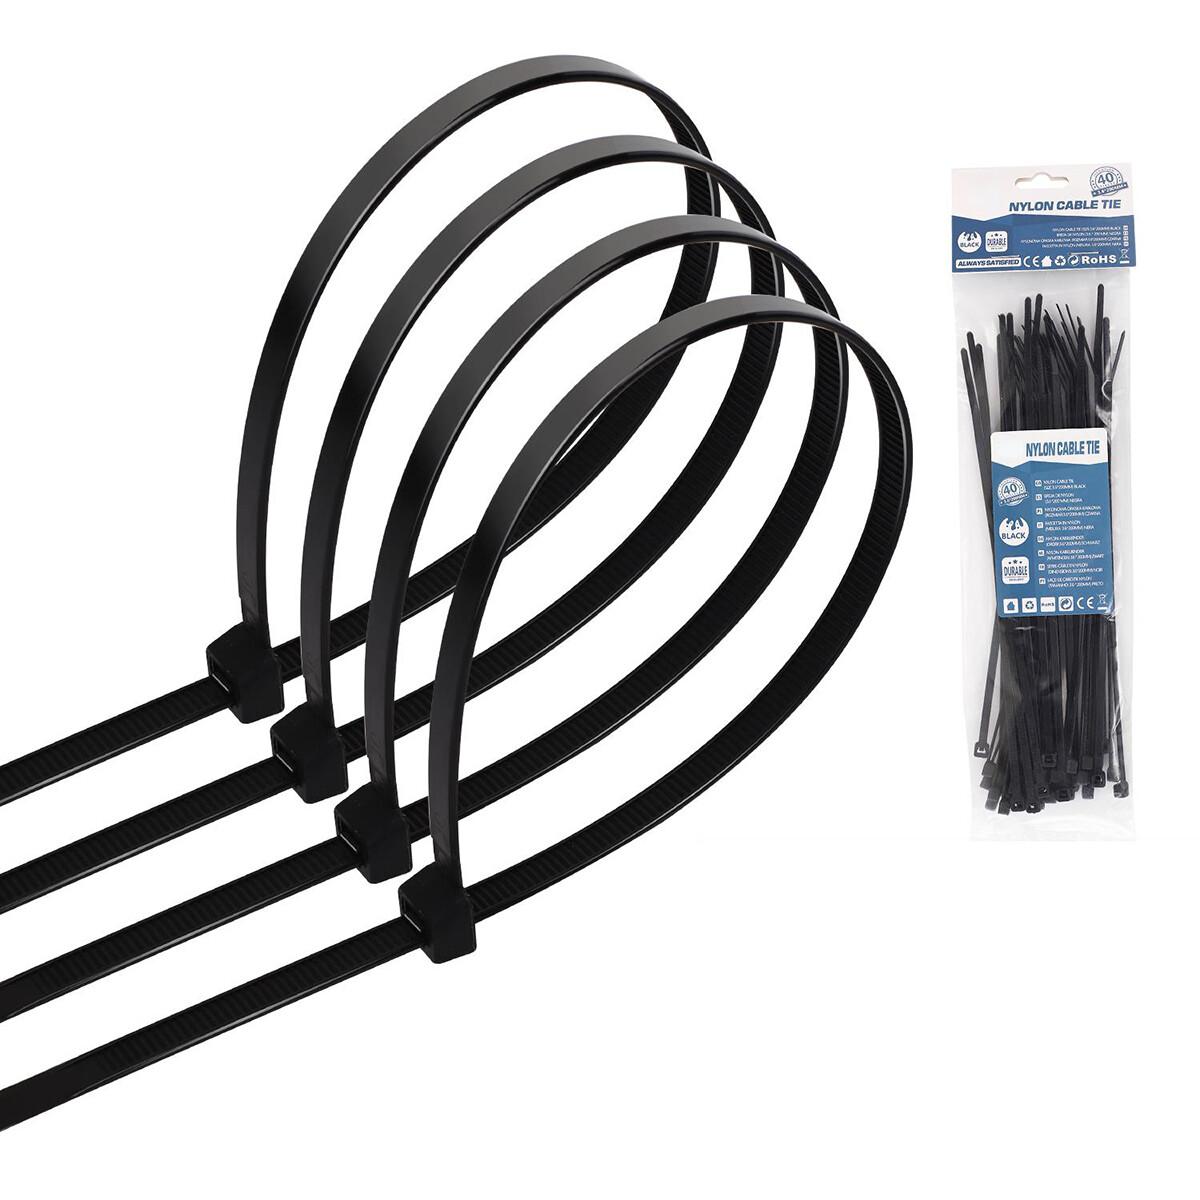 Tie Wraps - Tyrap - Aigi Tie - 3.6x200mm - Zwart - 40 Stuks